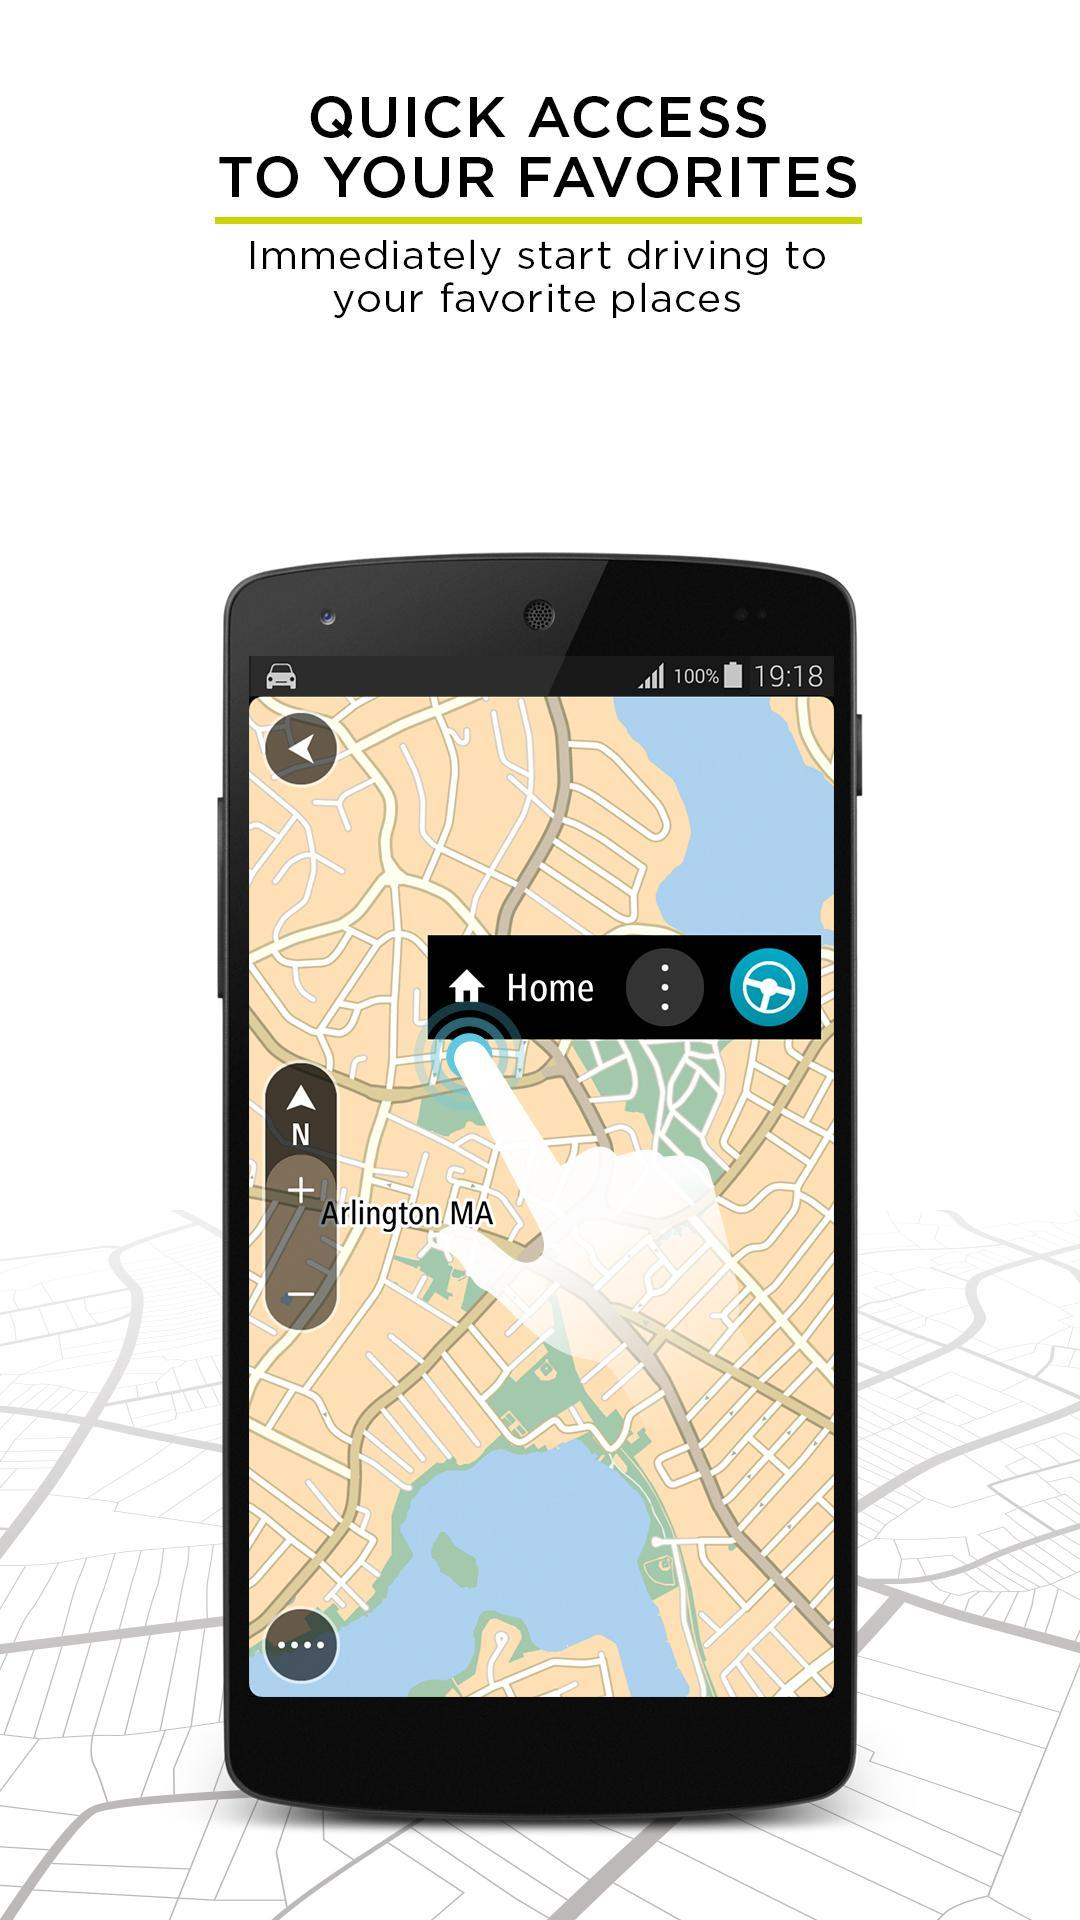 TomTom GPS Navigation - Live Traffic Alerts & Maps 2.0.4 Screenshot 3